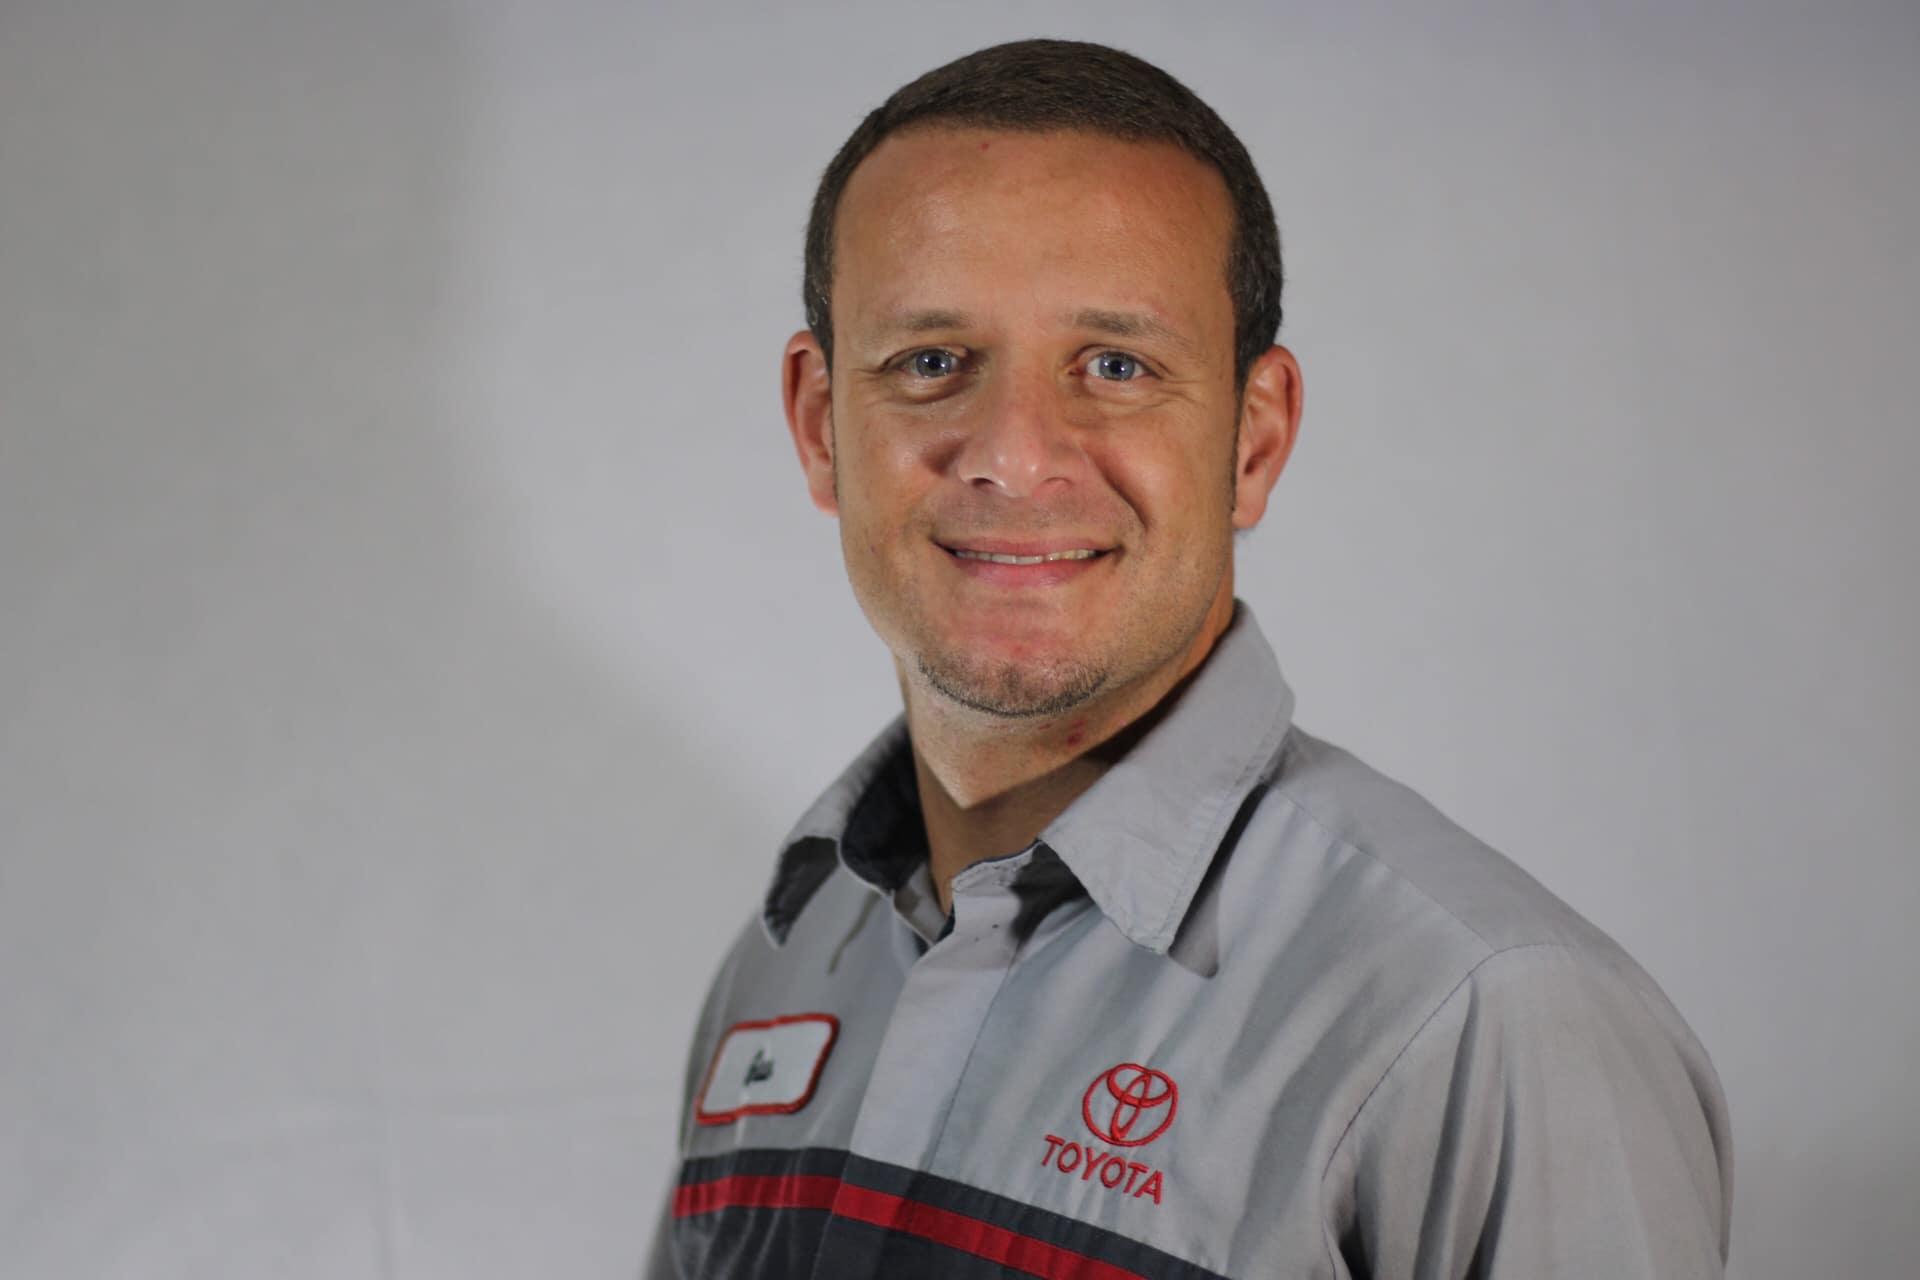 Gustavo Acosta